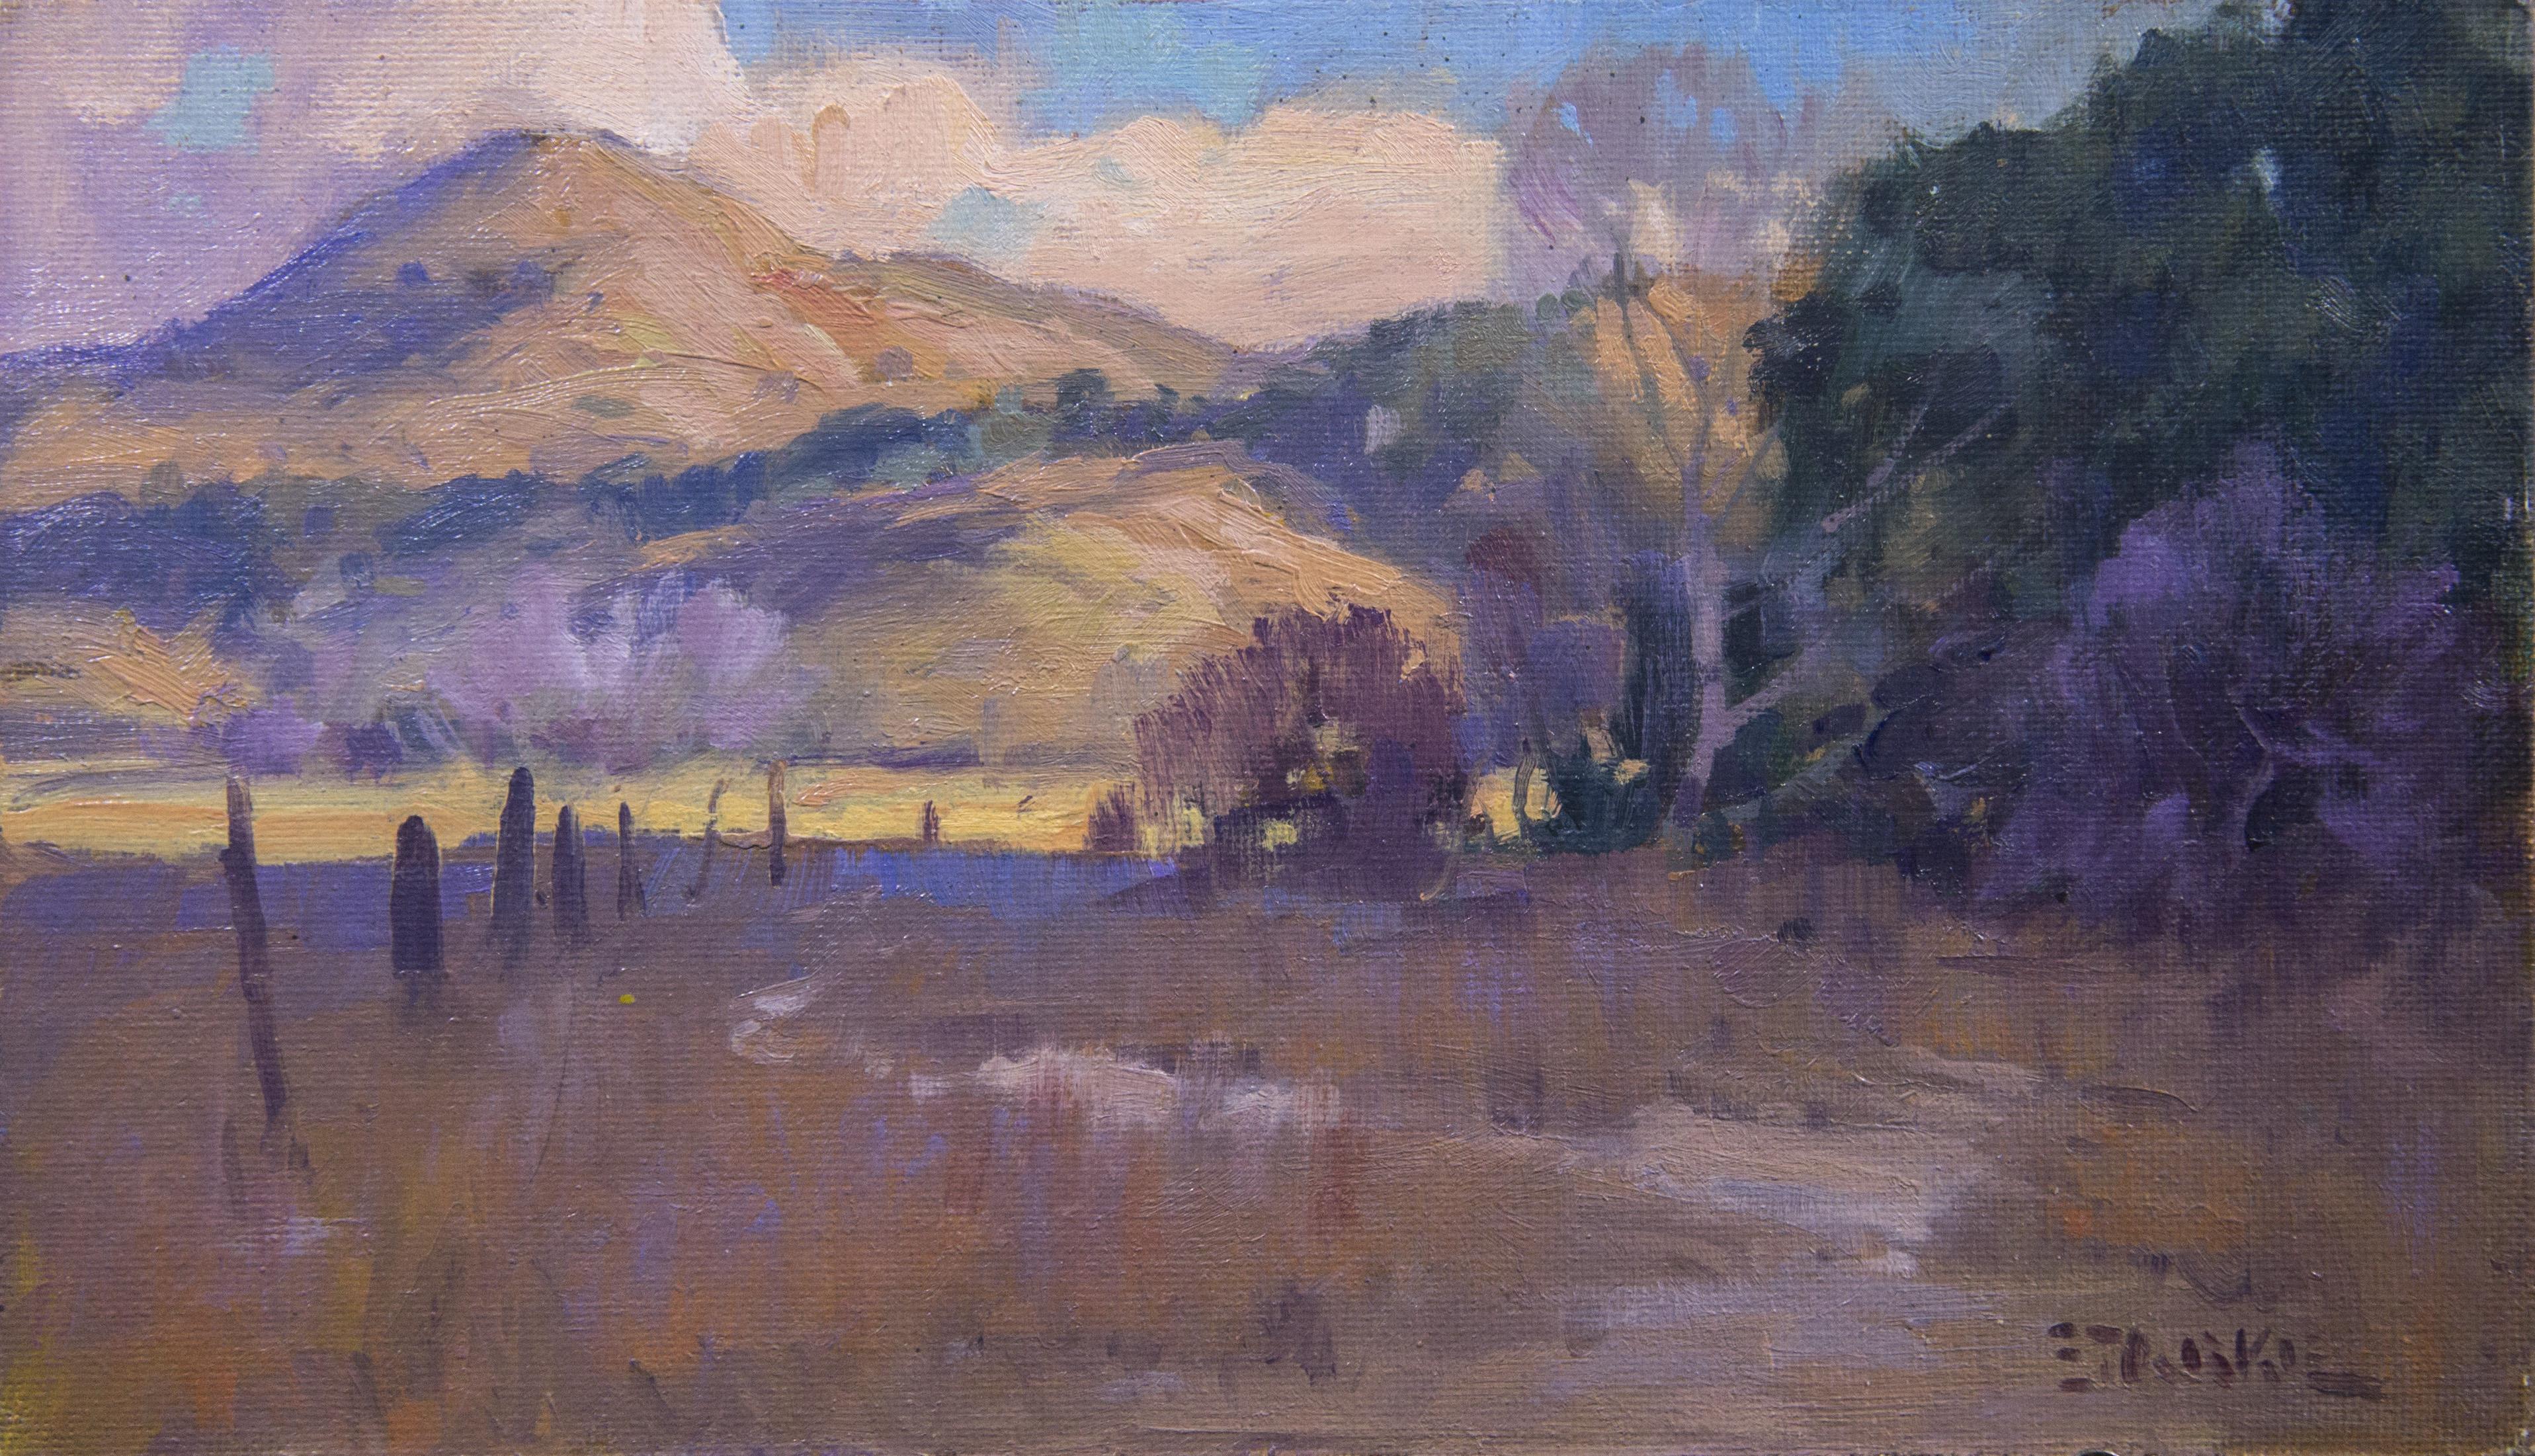 San Rafael Valley, Arizona 6x10